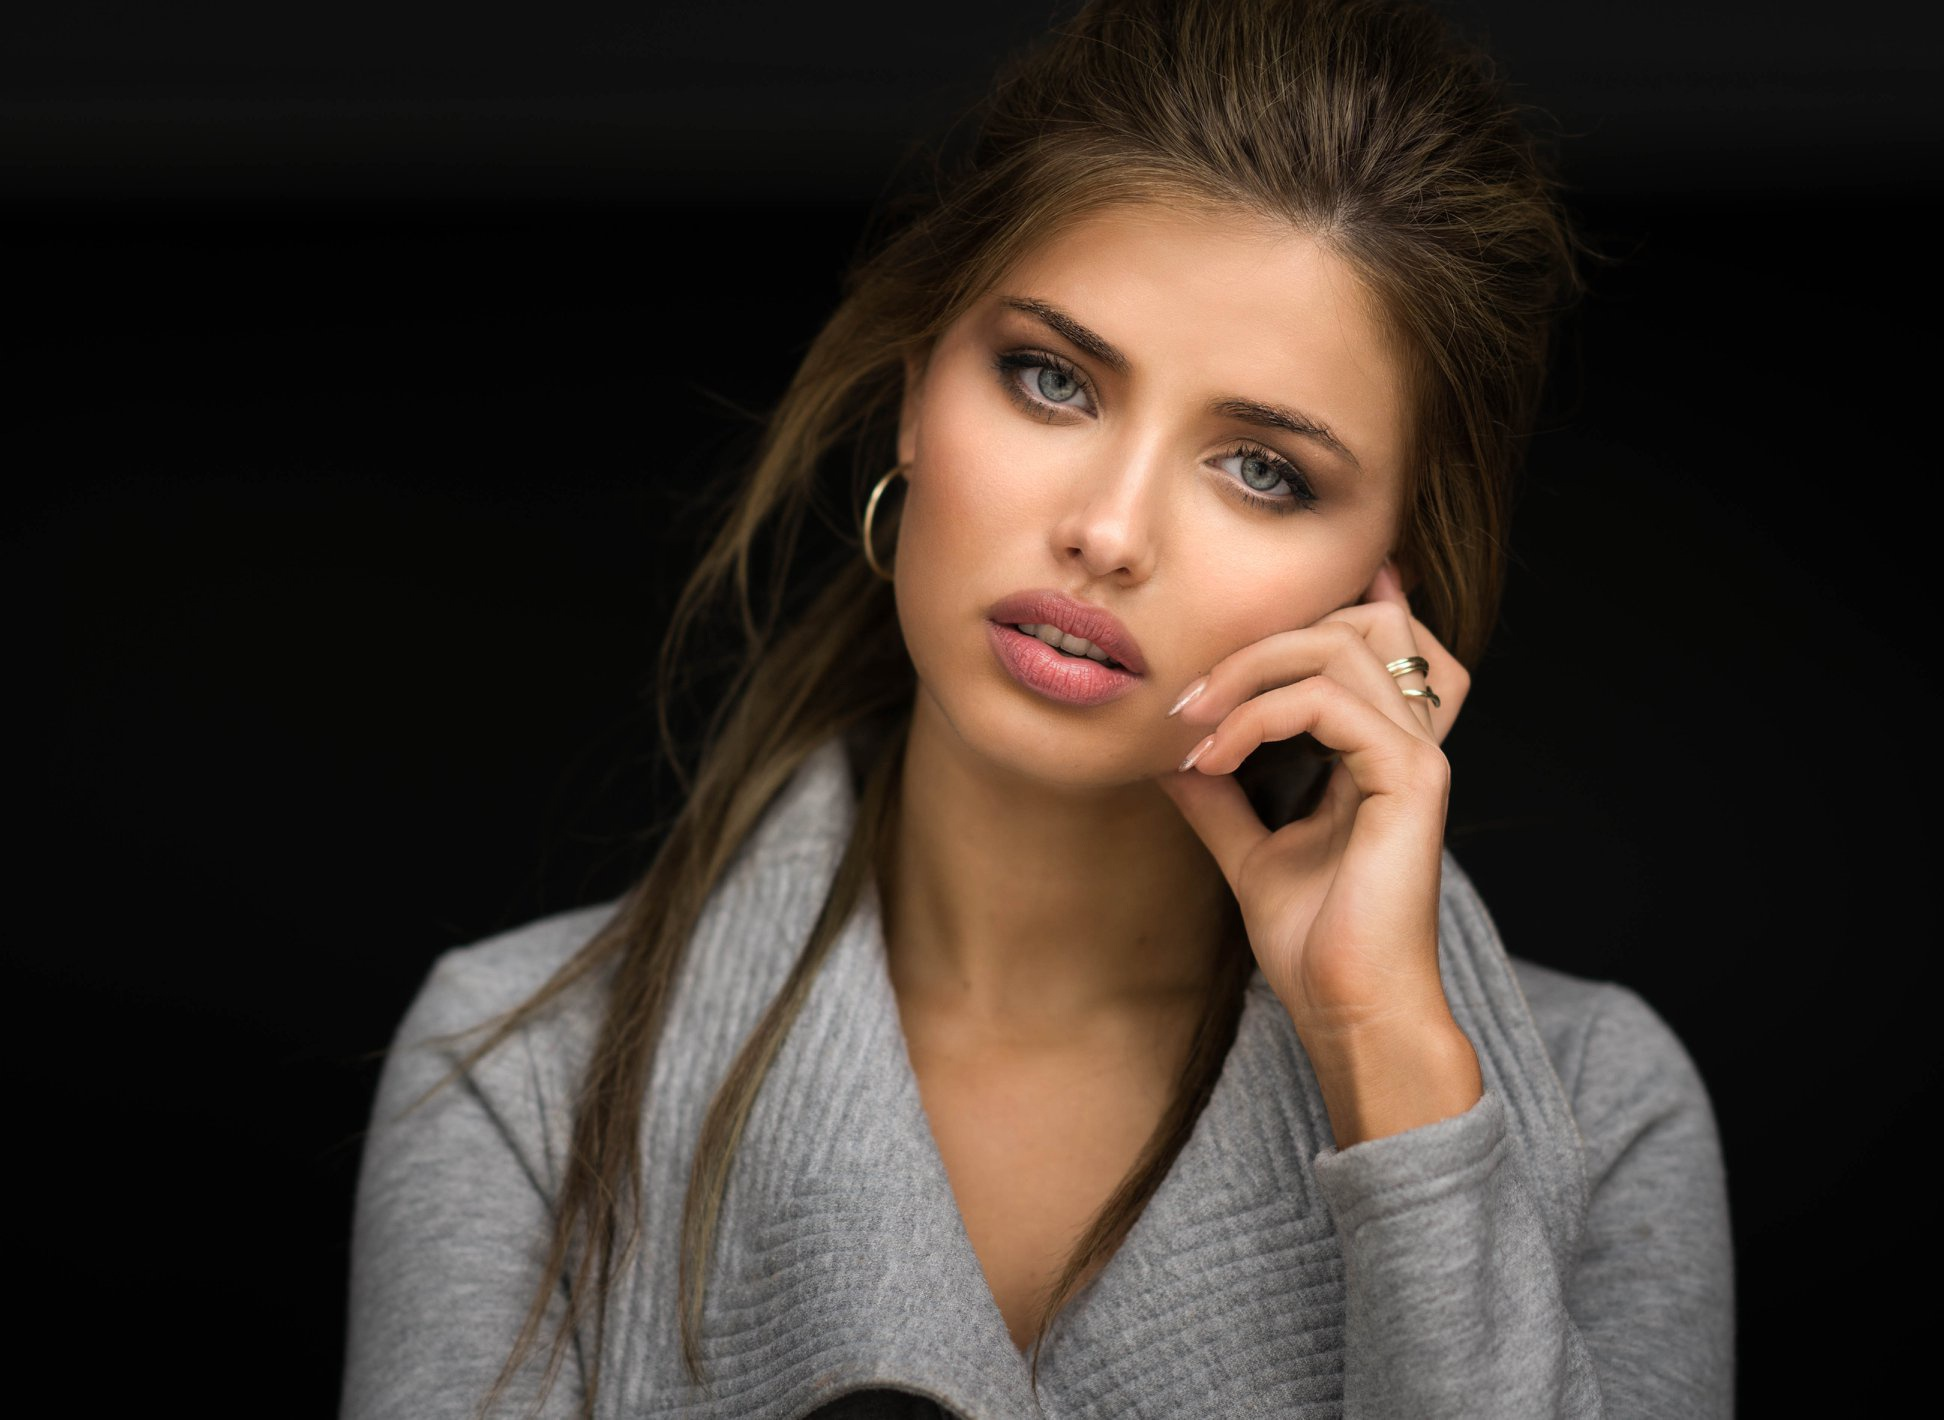 девушка глаза сережки  № 1817027 без смс